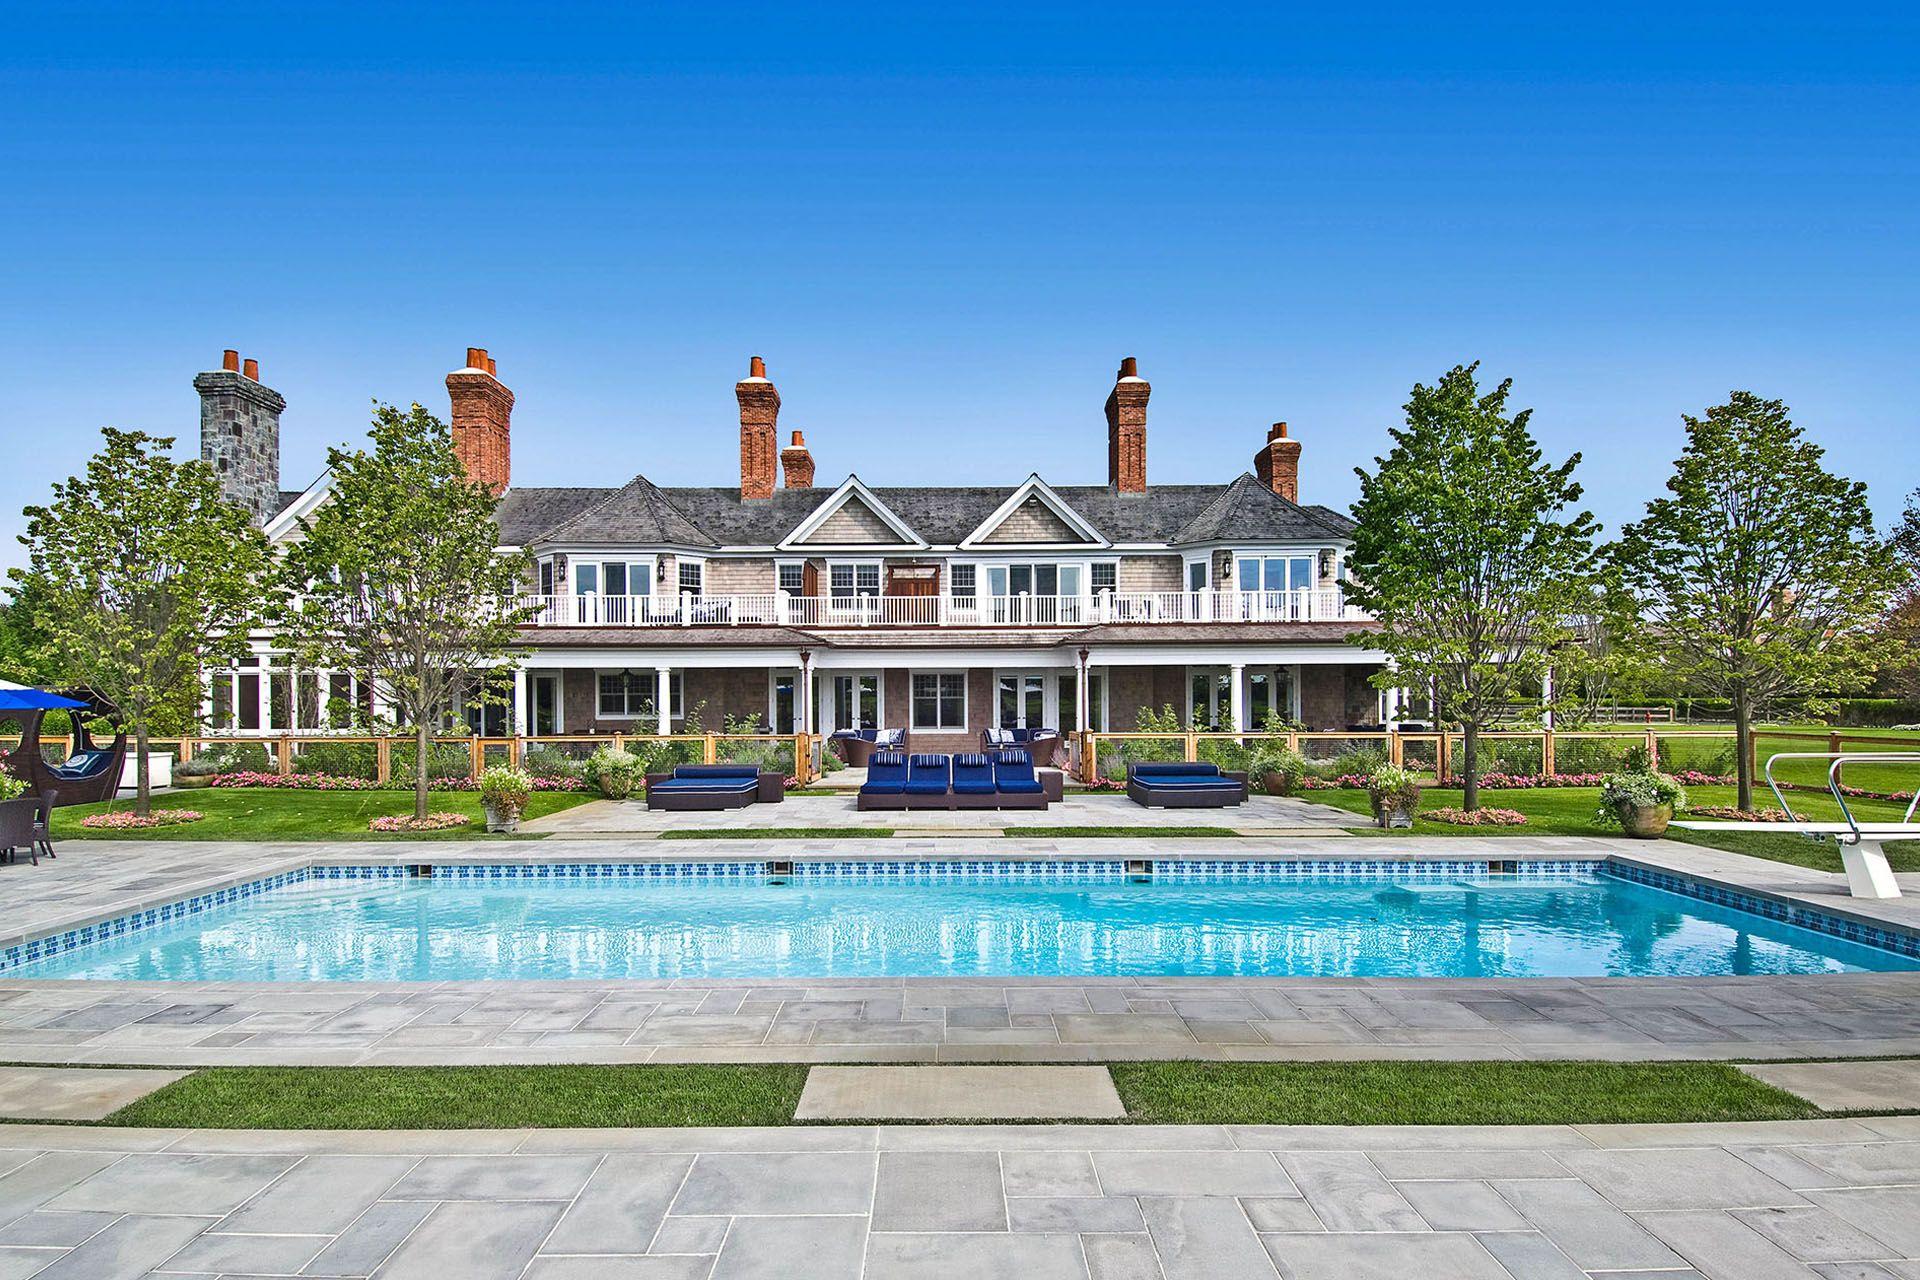 Beyonce And Jay Z S Former Hamptons Rental Is On The Market 50 Million Sandcastle Bridgehampton